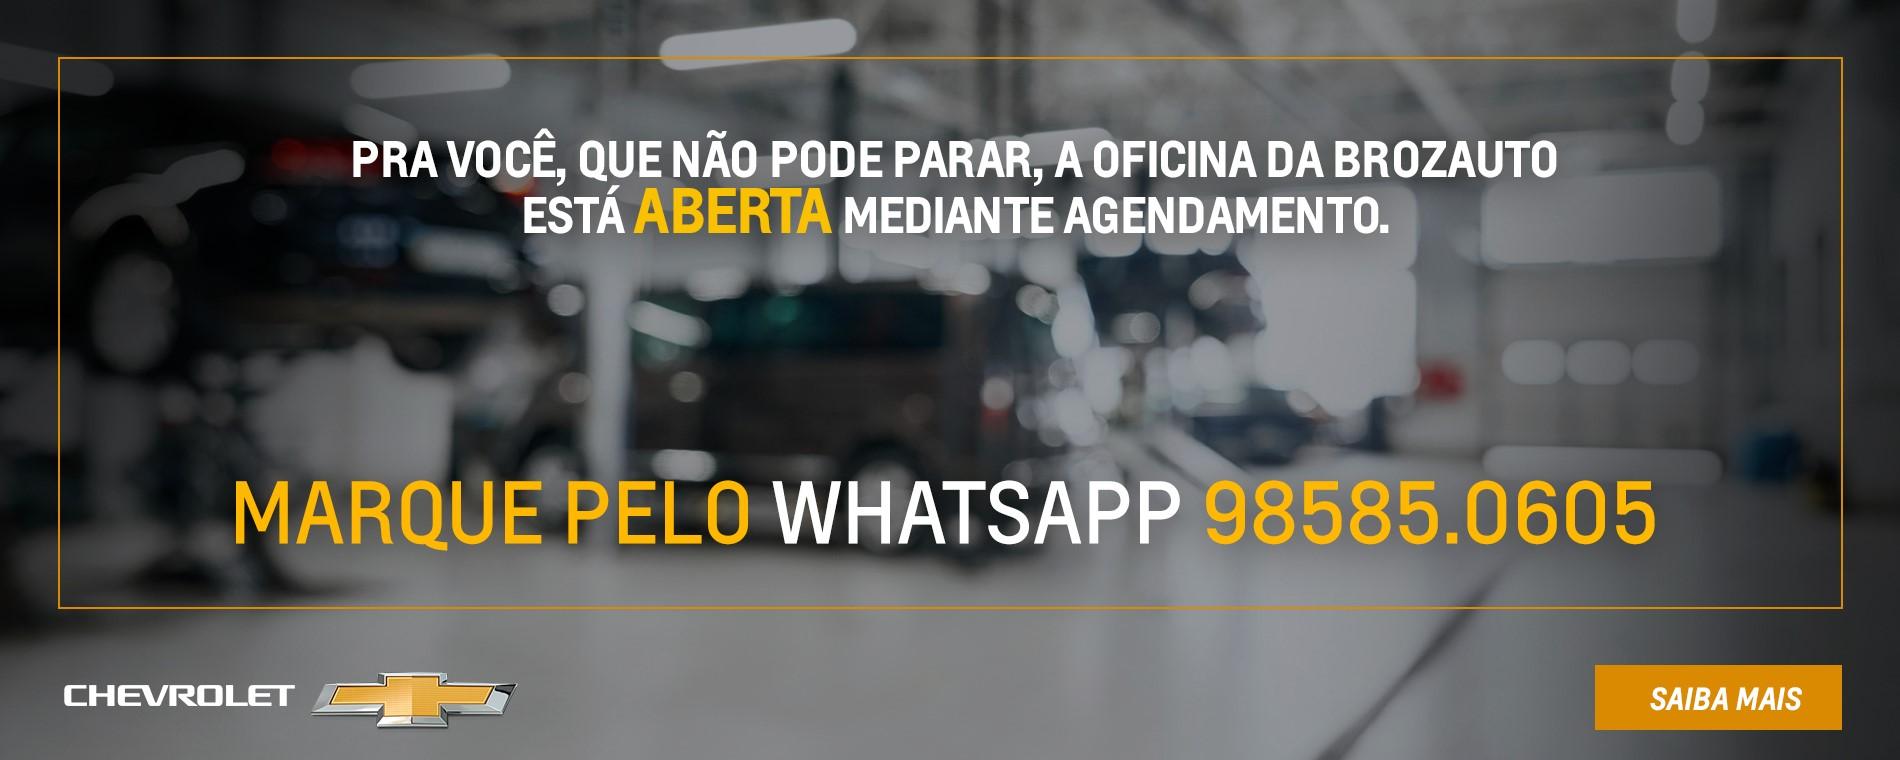 284_Brozauto_Agendamento_DestaqueDesk